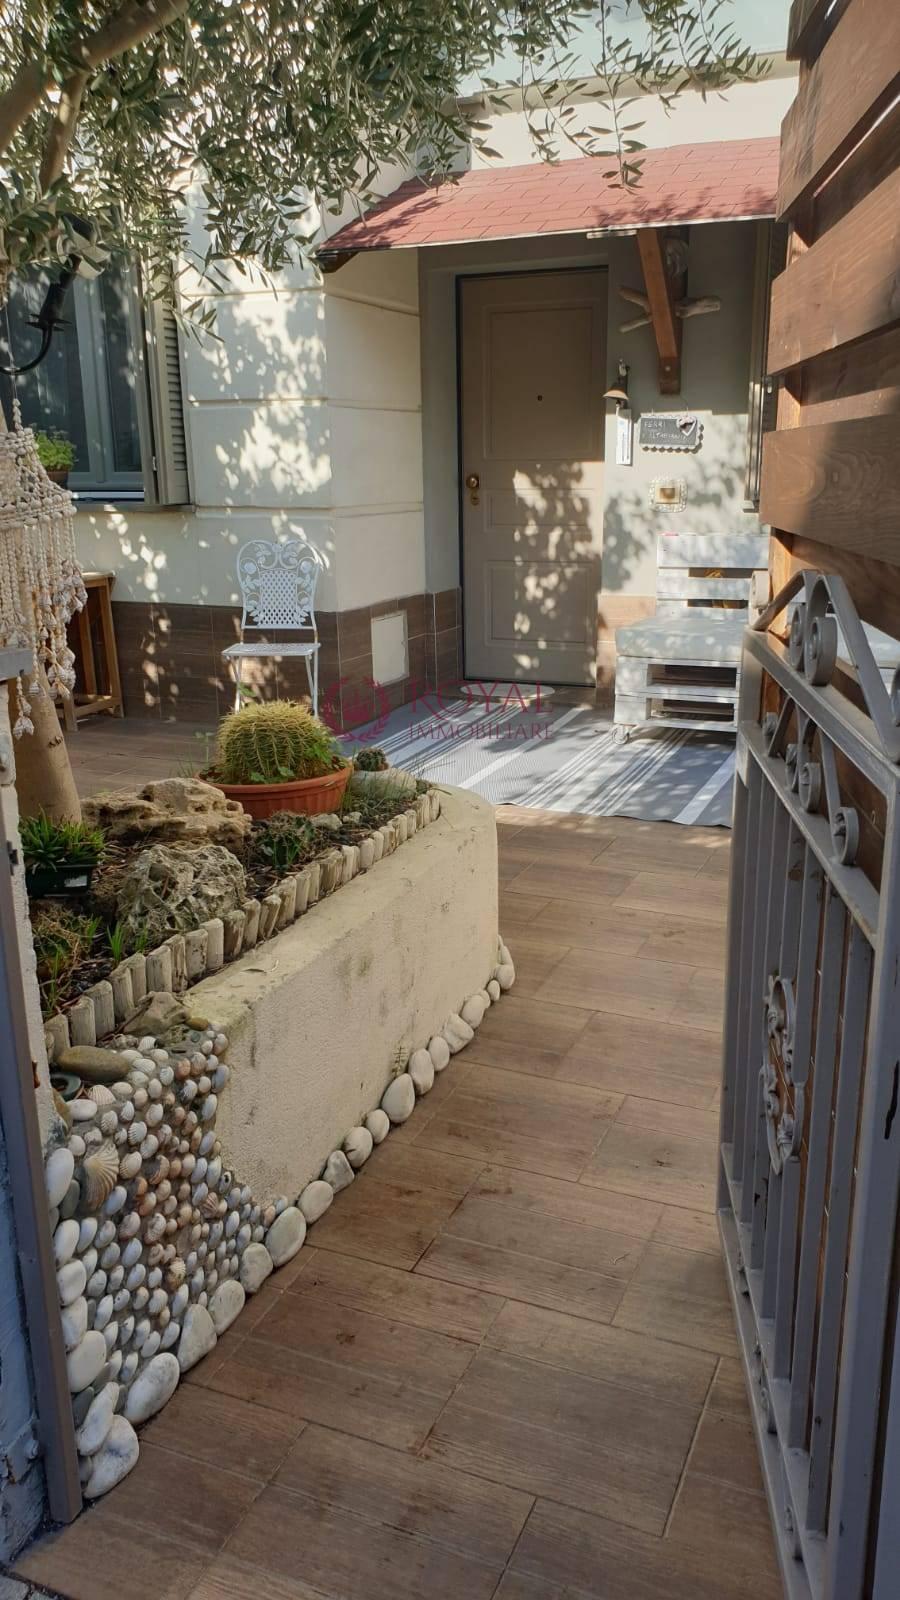 livorno vendita quart: borgo di magrignano royal immobiliare professional s.a.s.